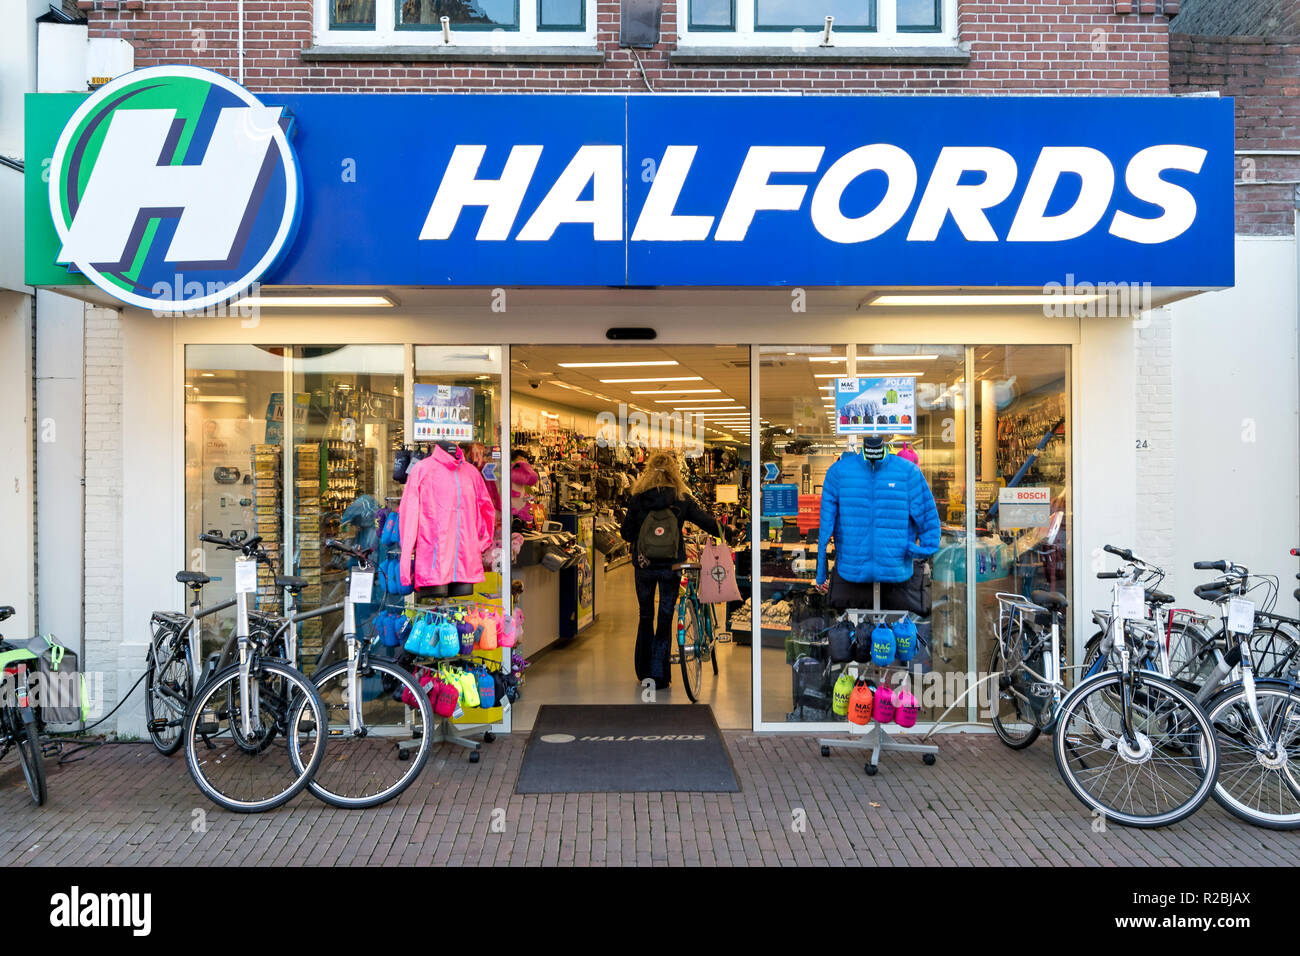 Halfords Bikes Stock Photos & Halfords Bikes Stock Images - Alamy